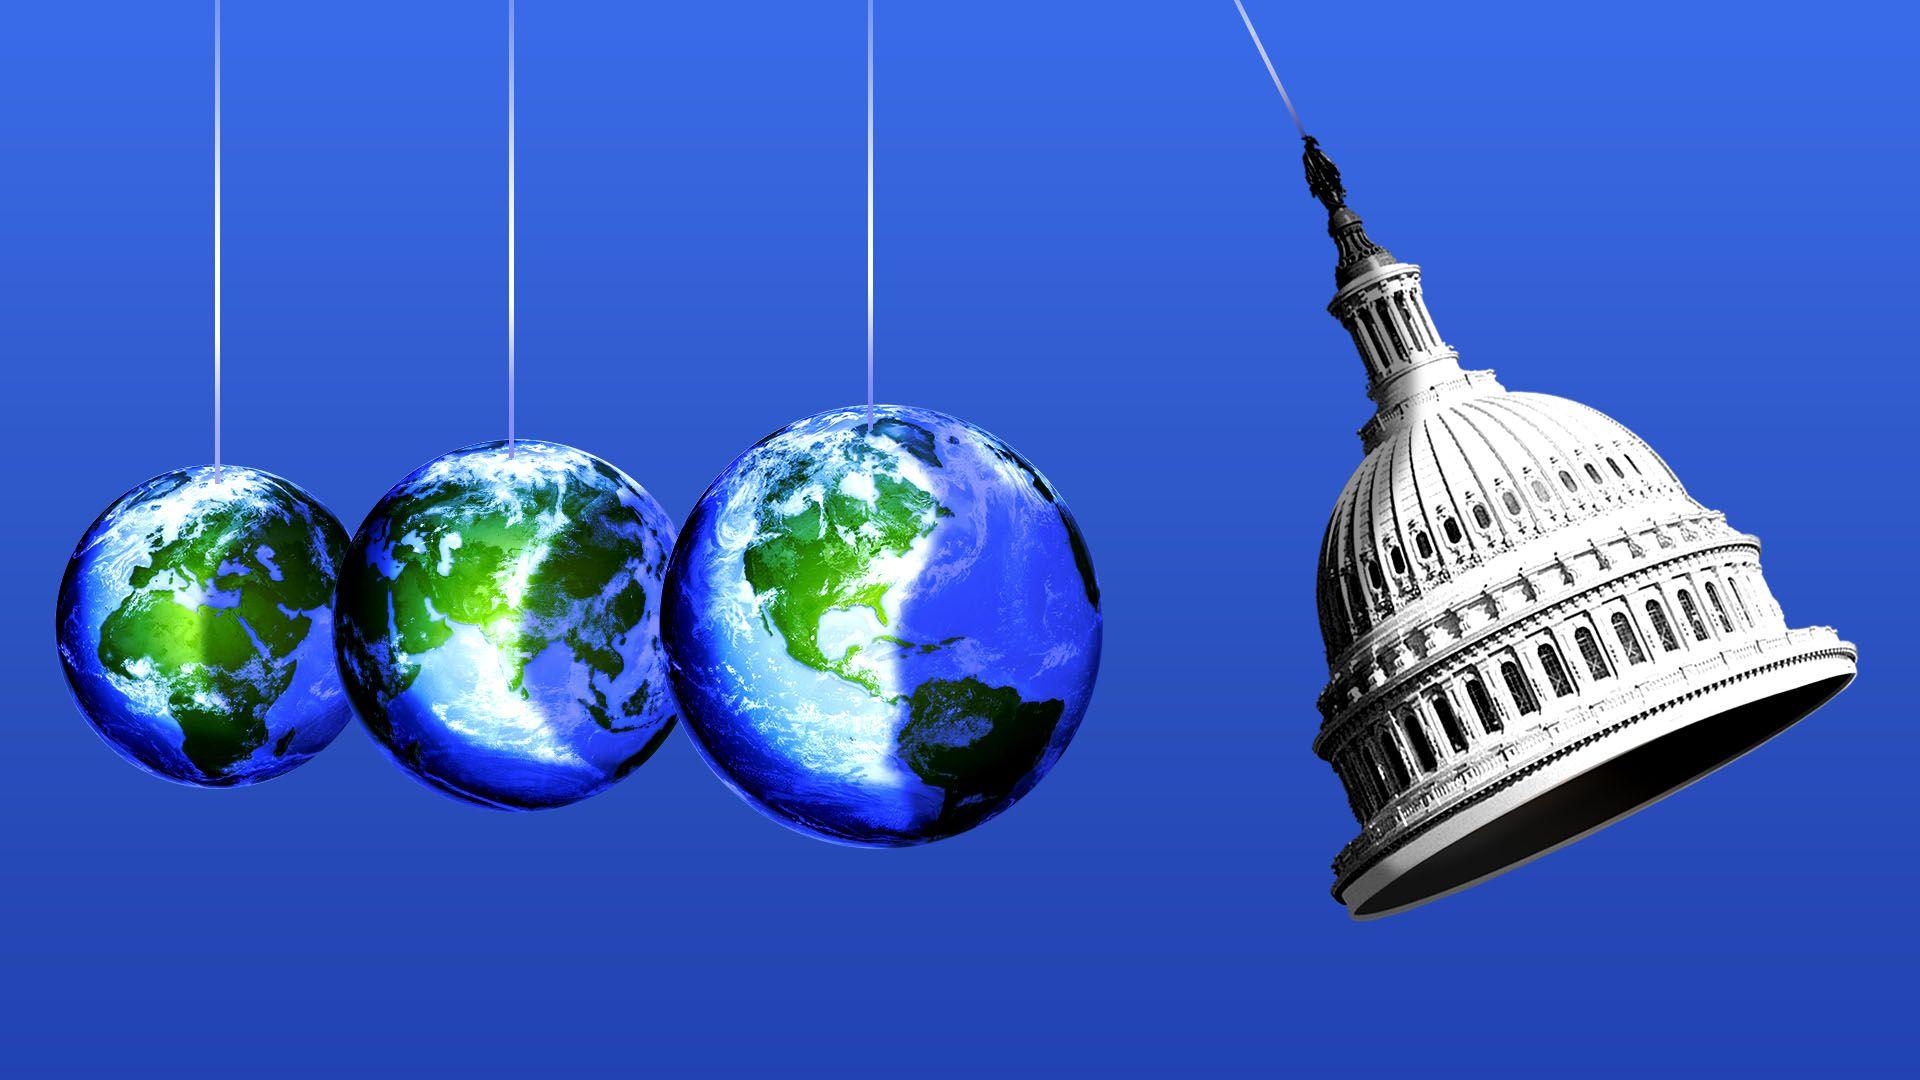 3. Making sense of the Senate climate vote